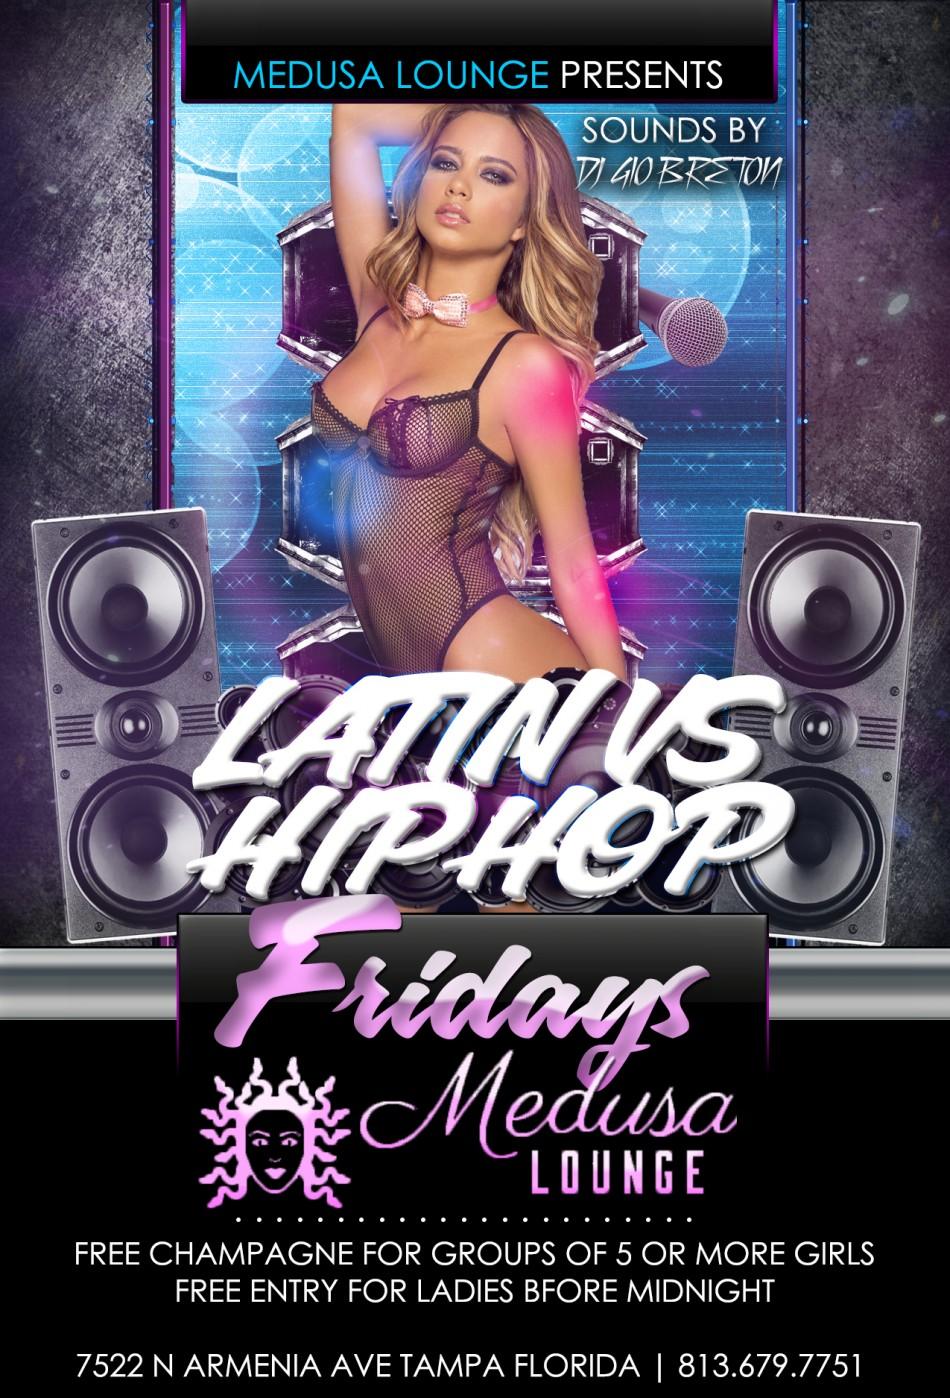 Latin VS Hip-Hop Friday's @ Medusa Lounge